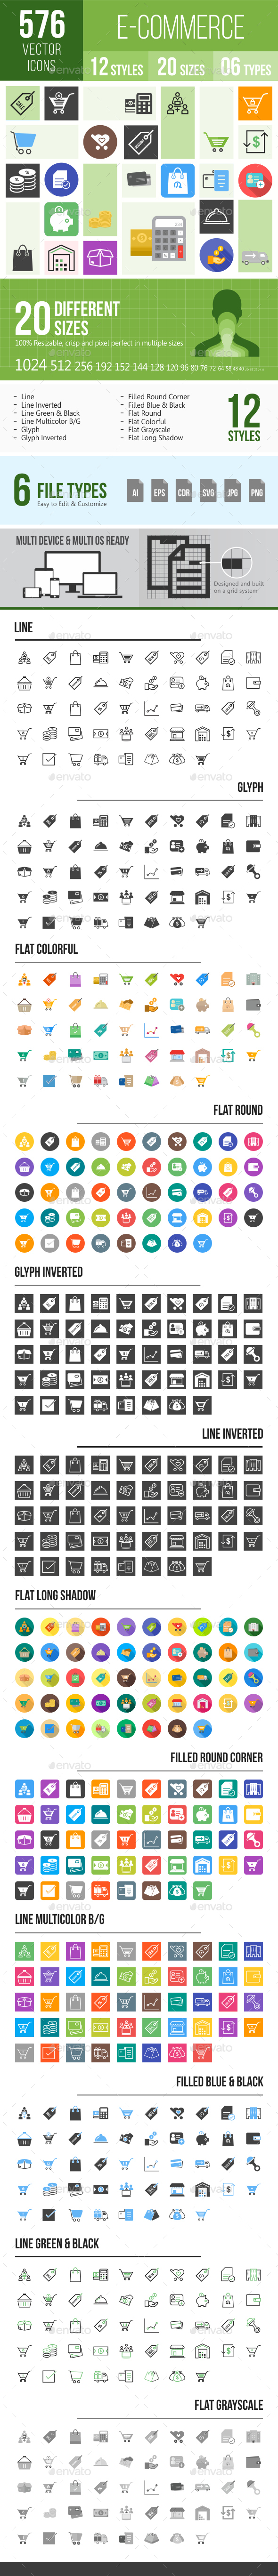 576 Ecommerce Icons - Icons